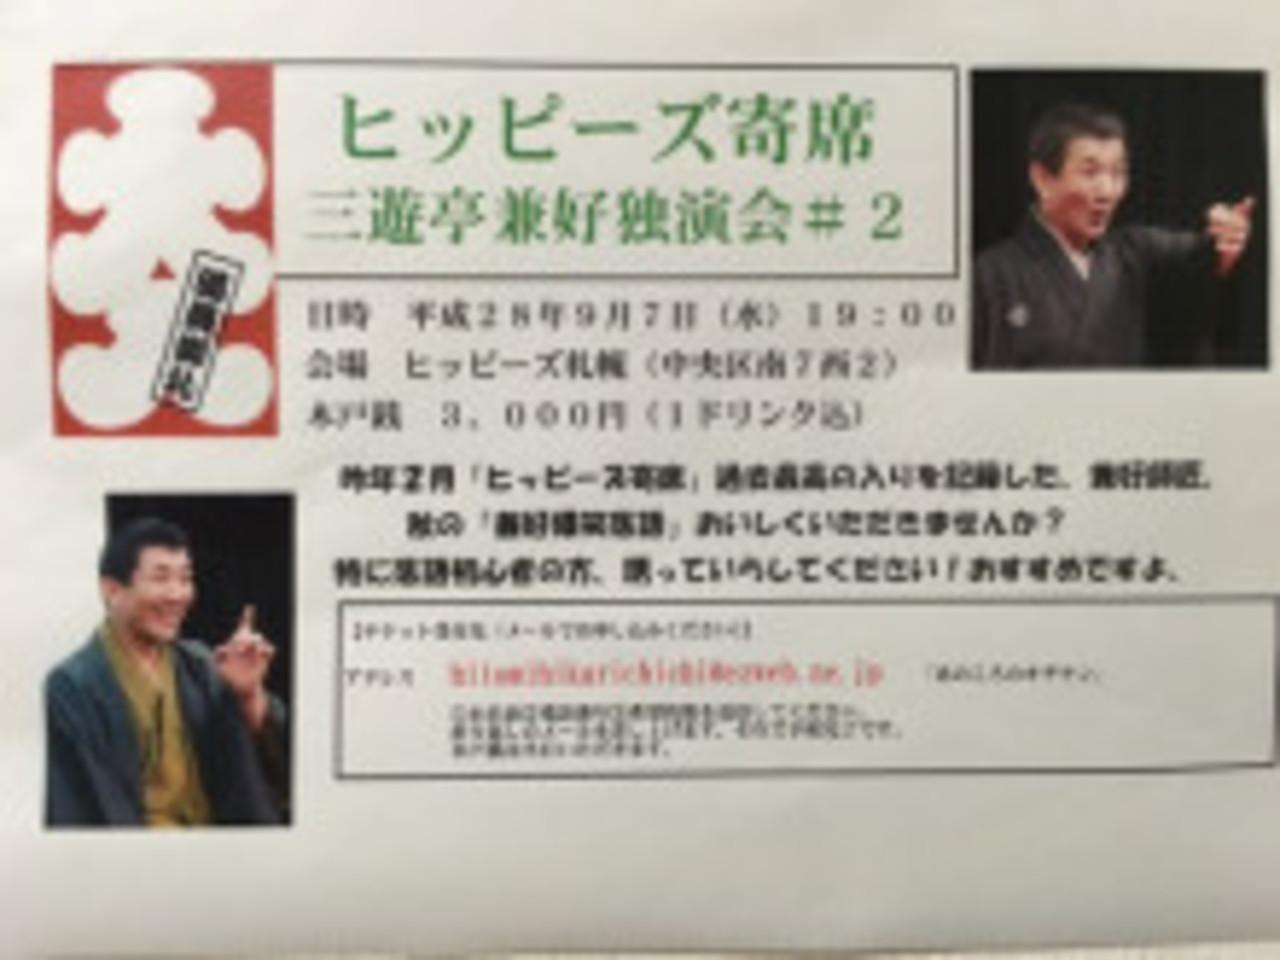 ヒッピーズ寄席 三遊亭兼好独演会 中央区 (9/7) 札幌